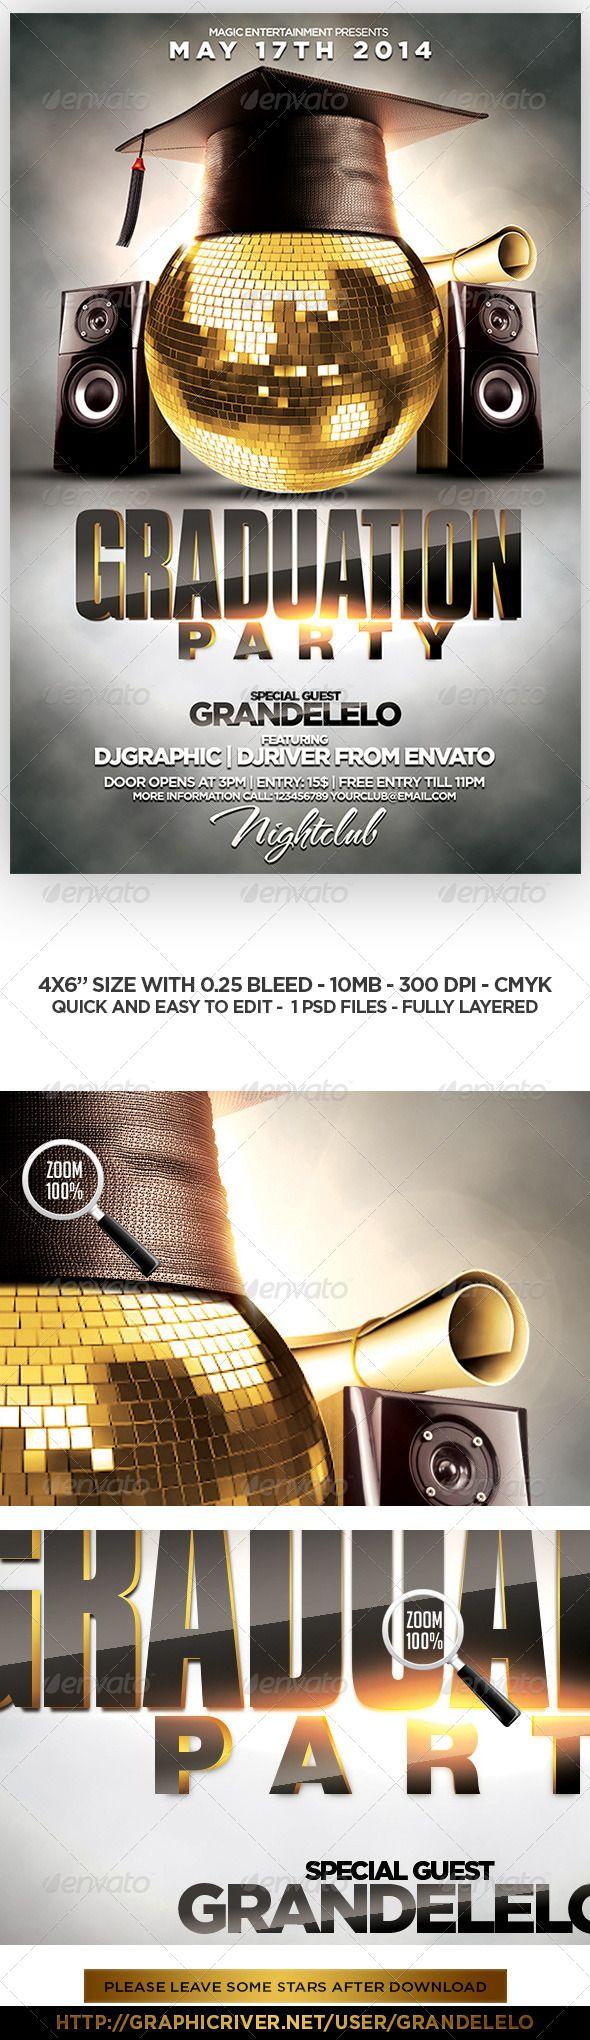 Graduation Party Flyer Template | Ads | Pinterest | Flyer template ...